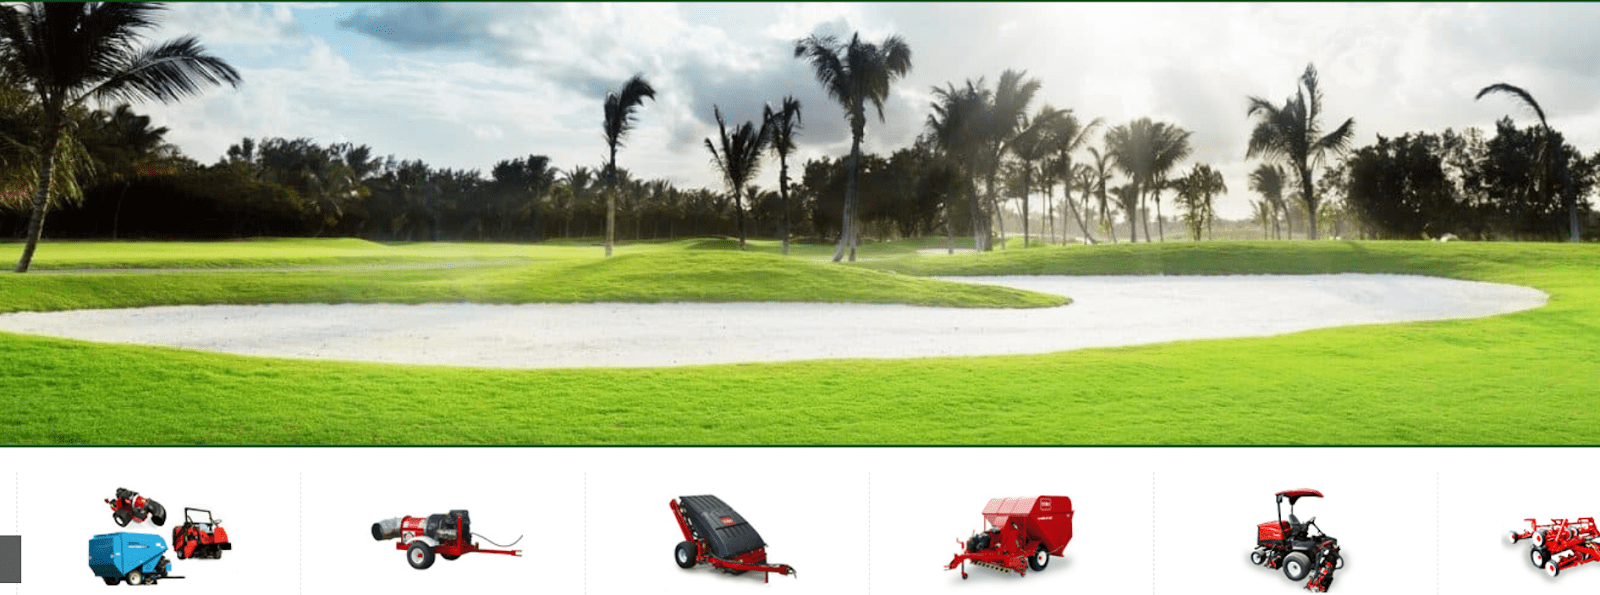 Golf Course Mowers Maintenance Equipment